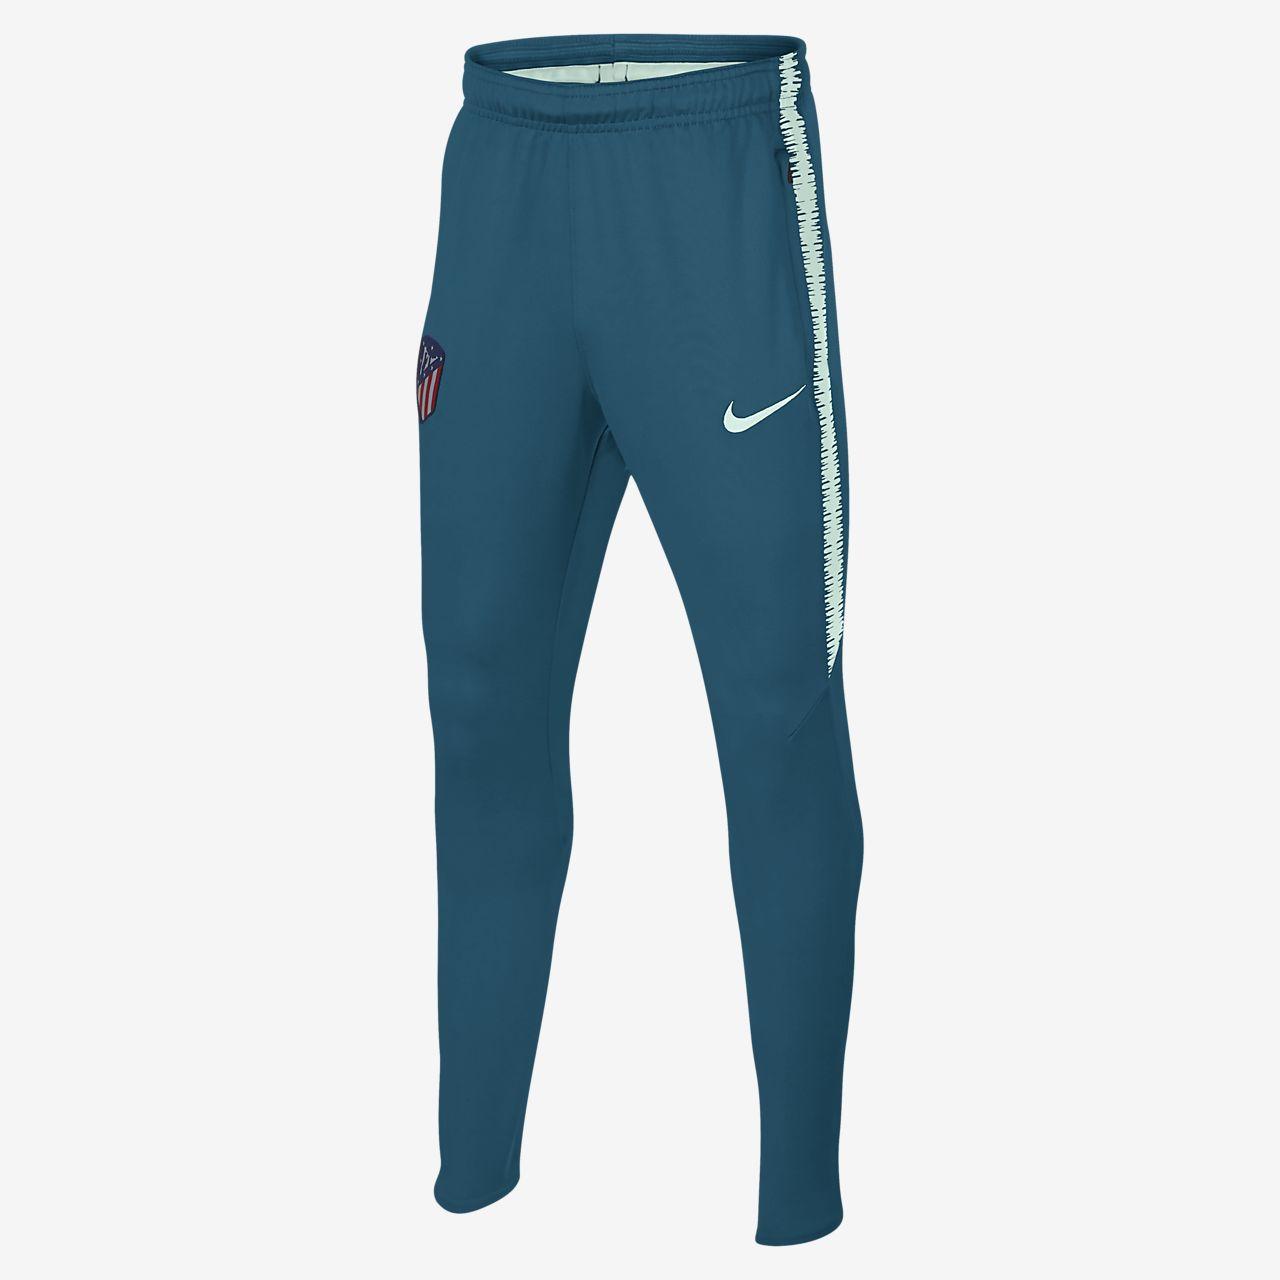 Atlético de Madrid Dri-FIT Squad Pantalón de fútbol - Niño a. Nike ... 40ac463a3ec84